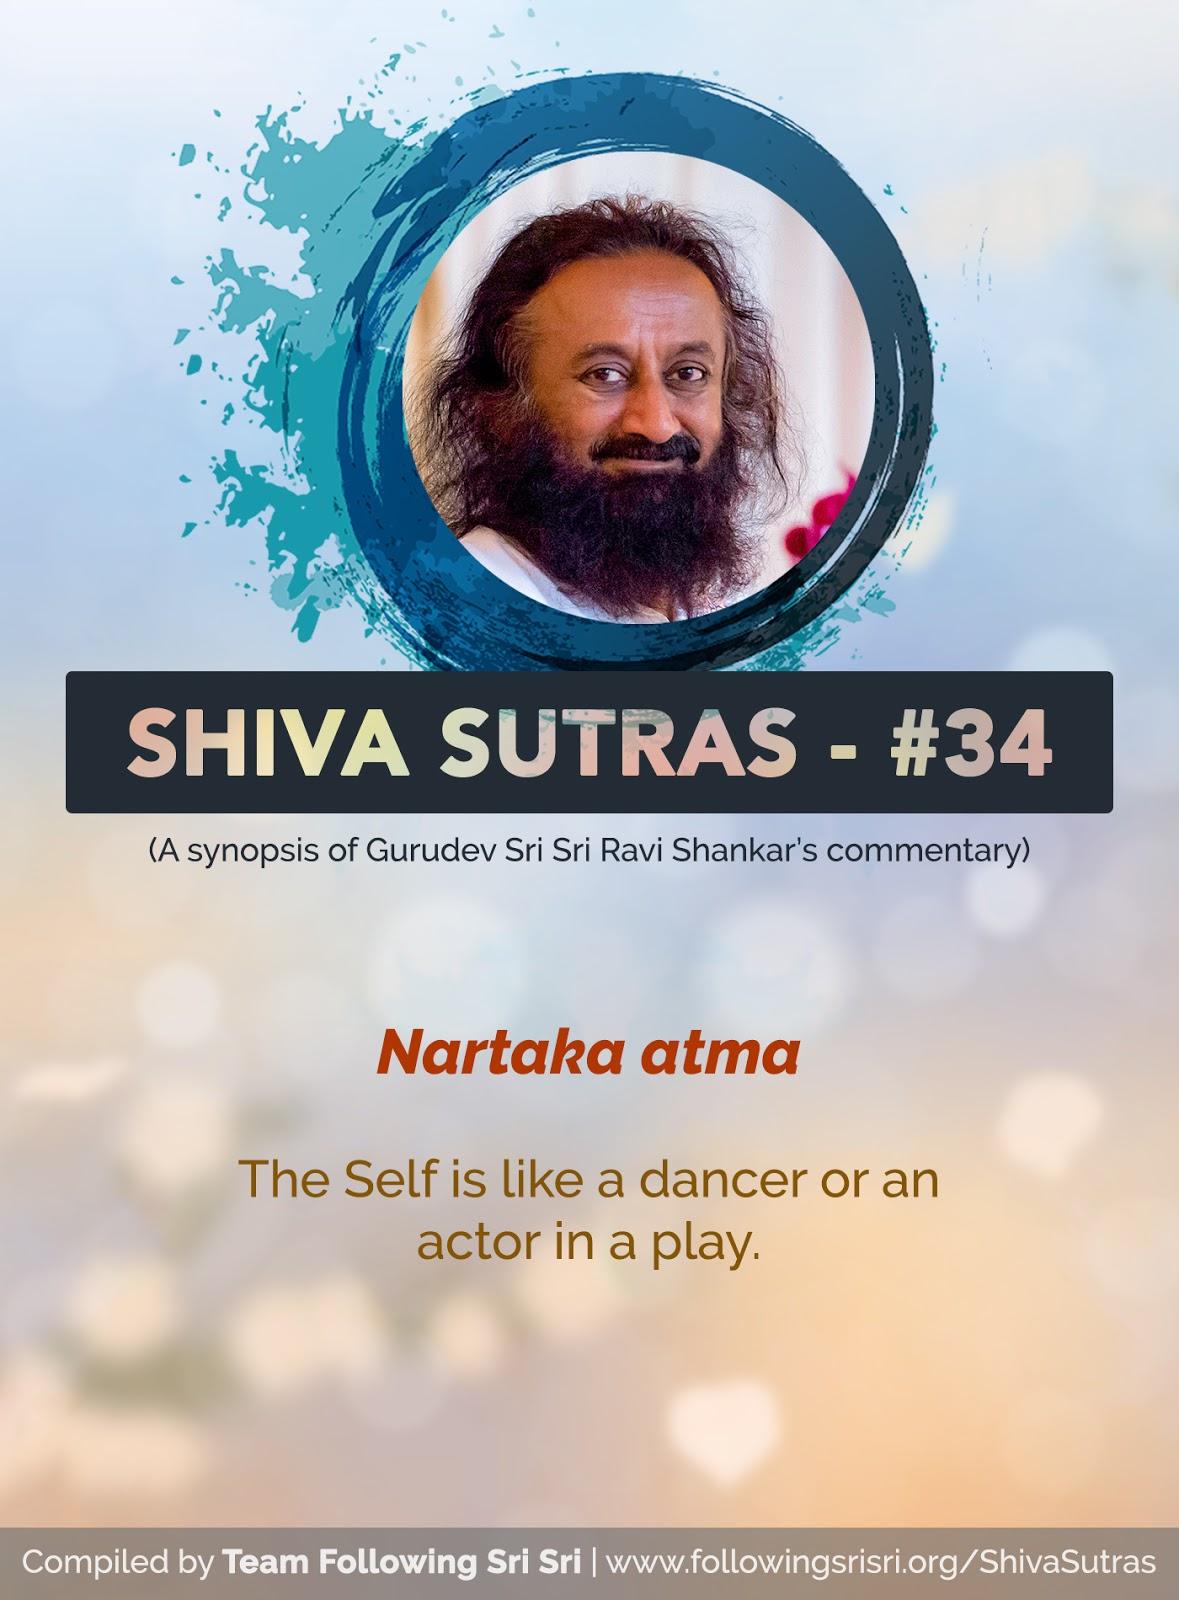 Shiva Sutras - Sutra 34